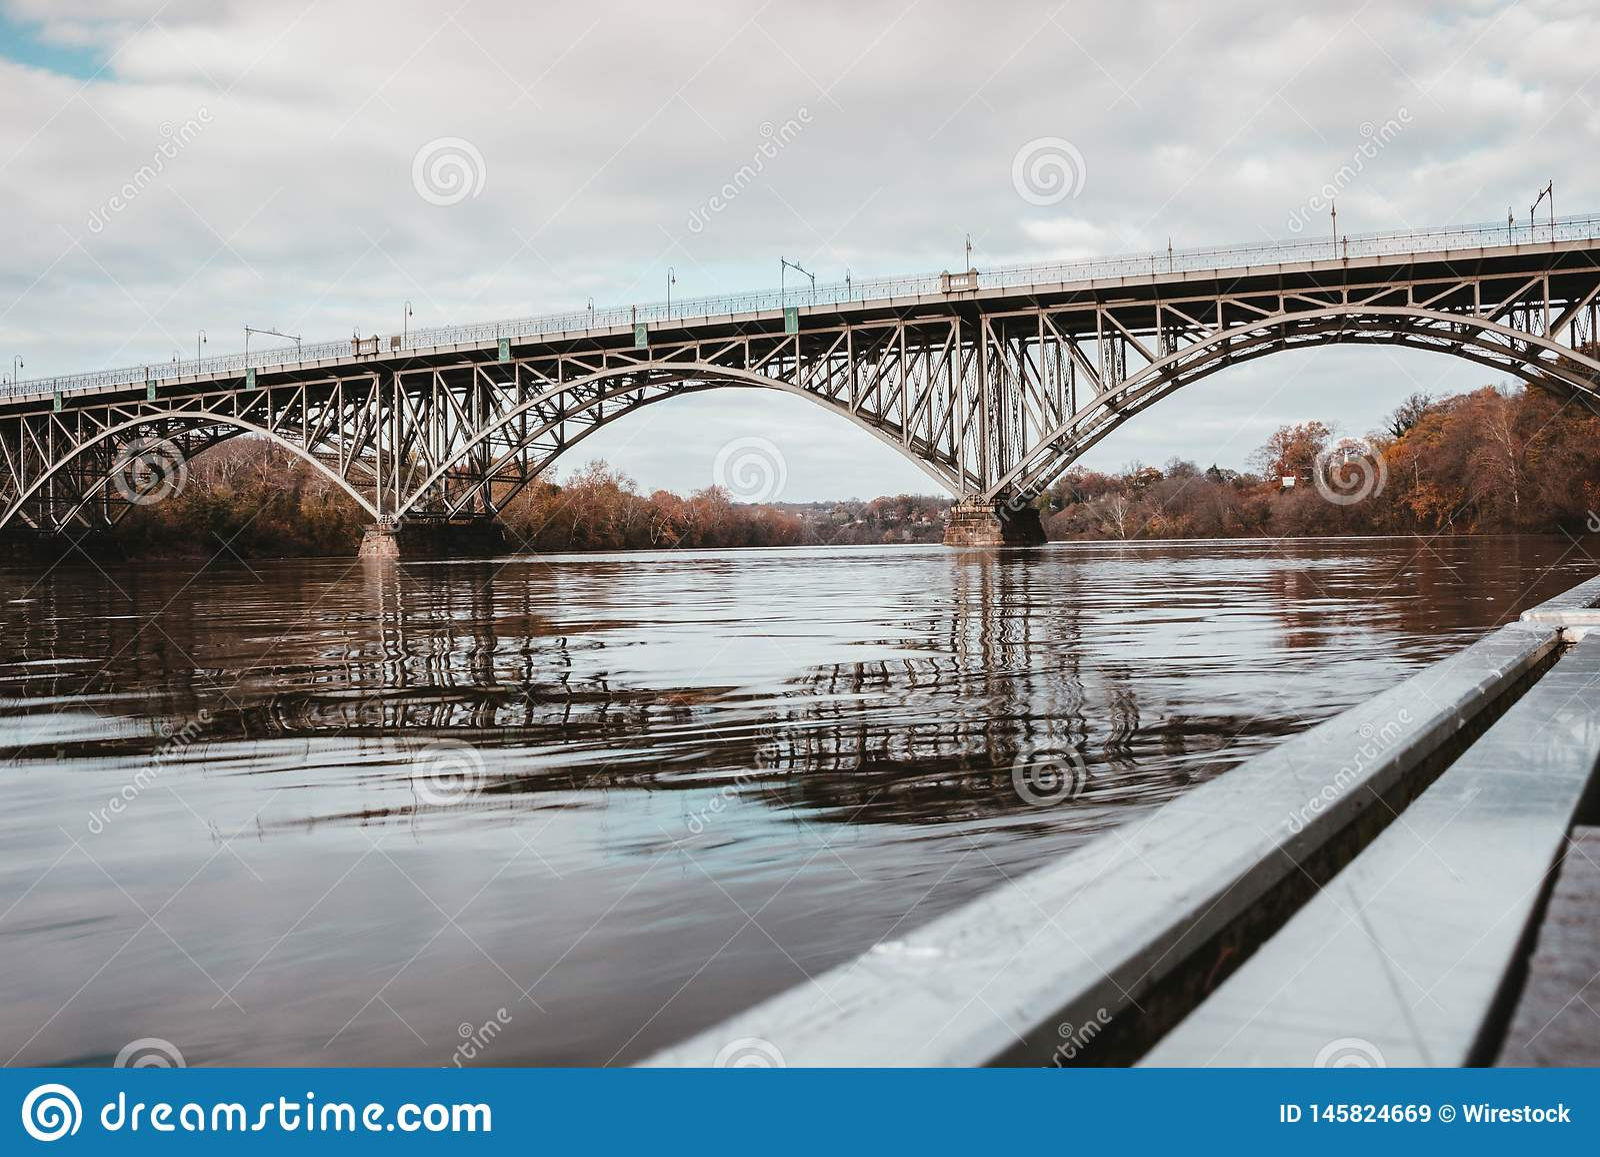 A steel bridge over a river